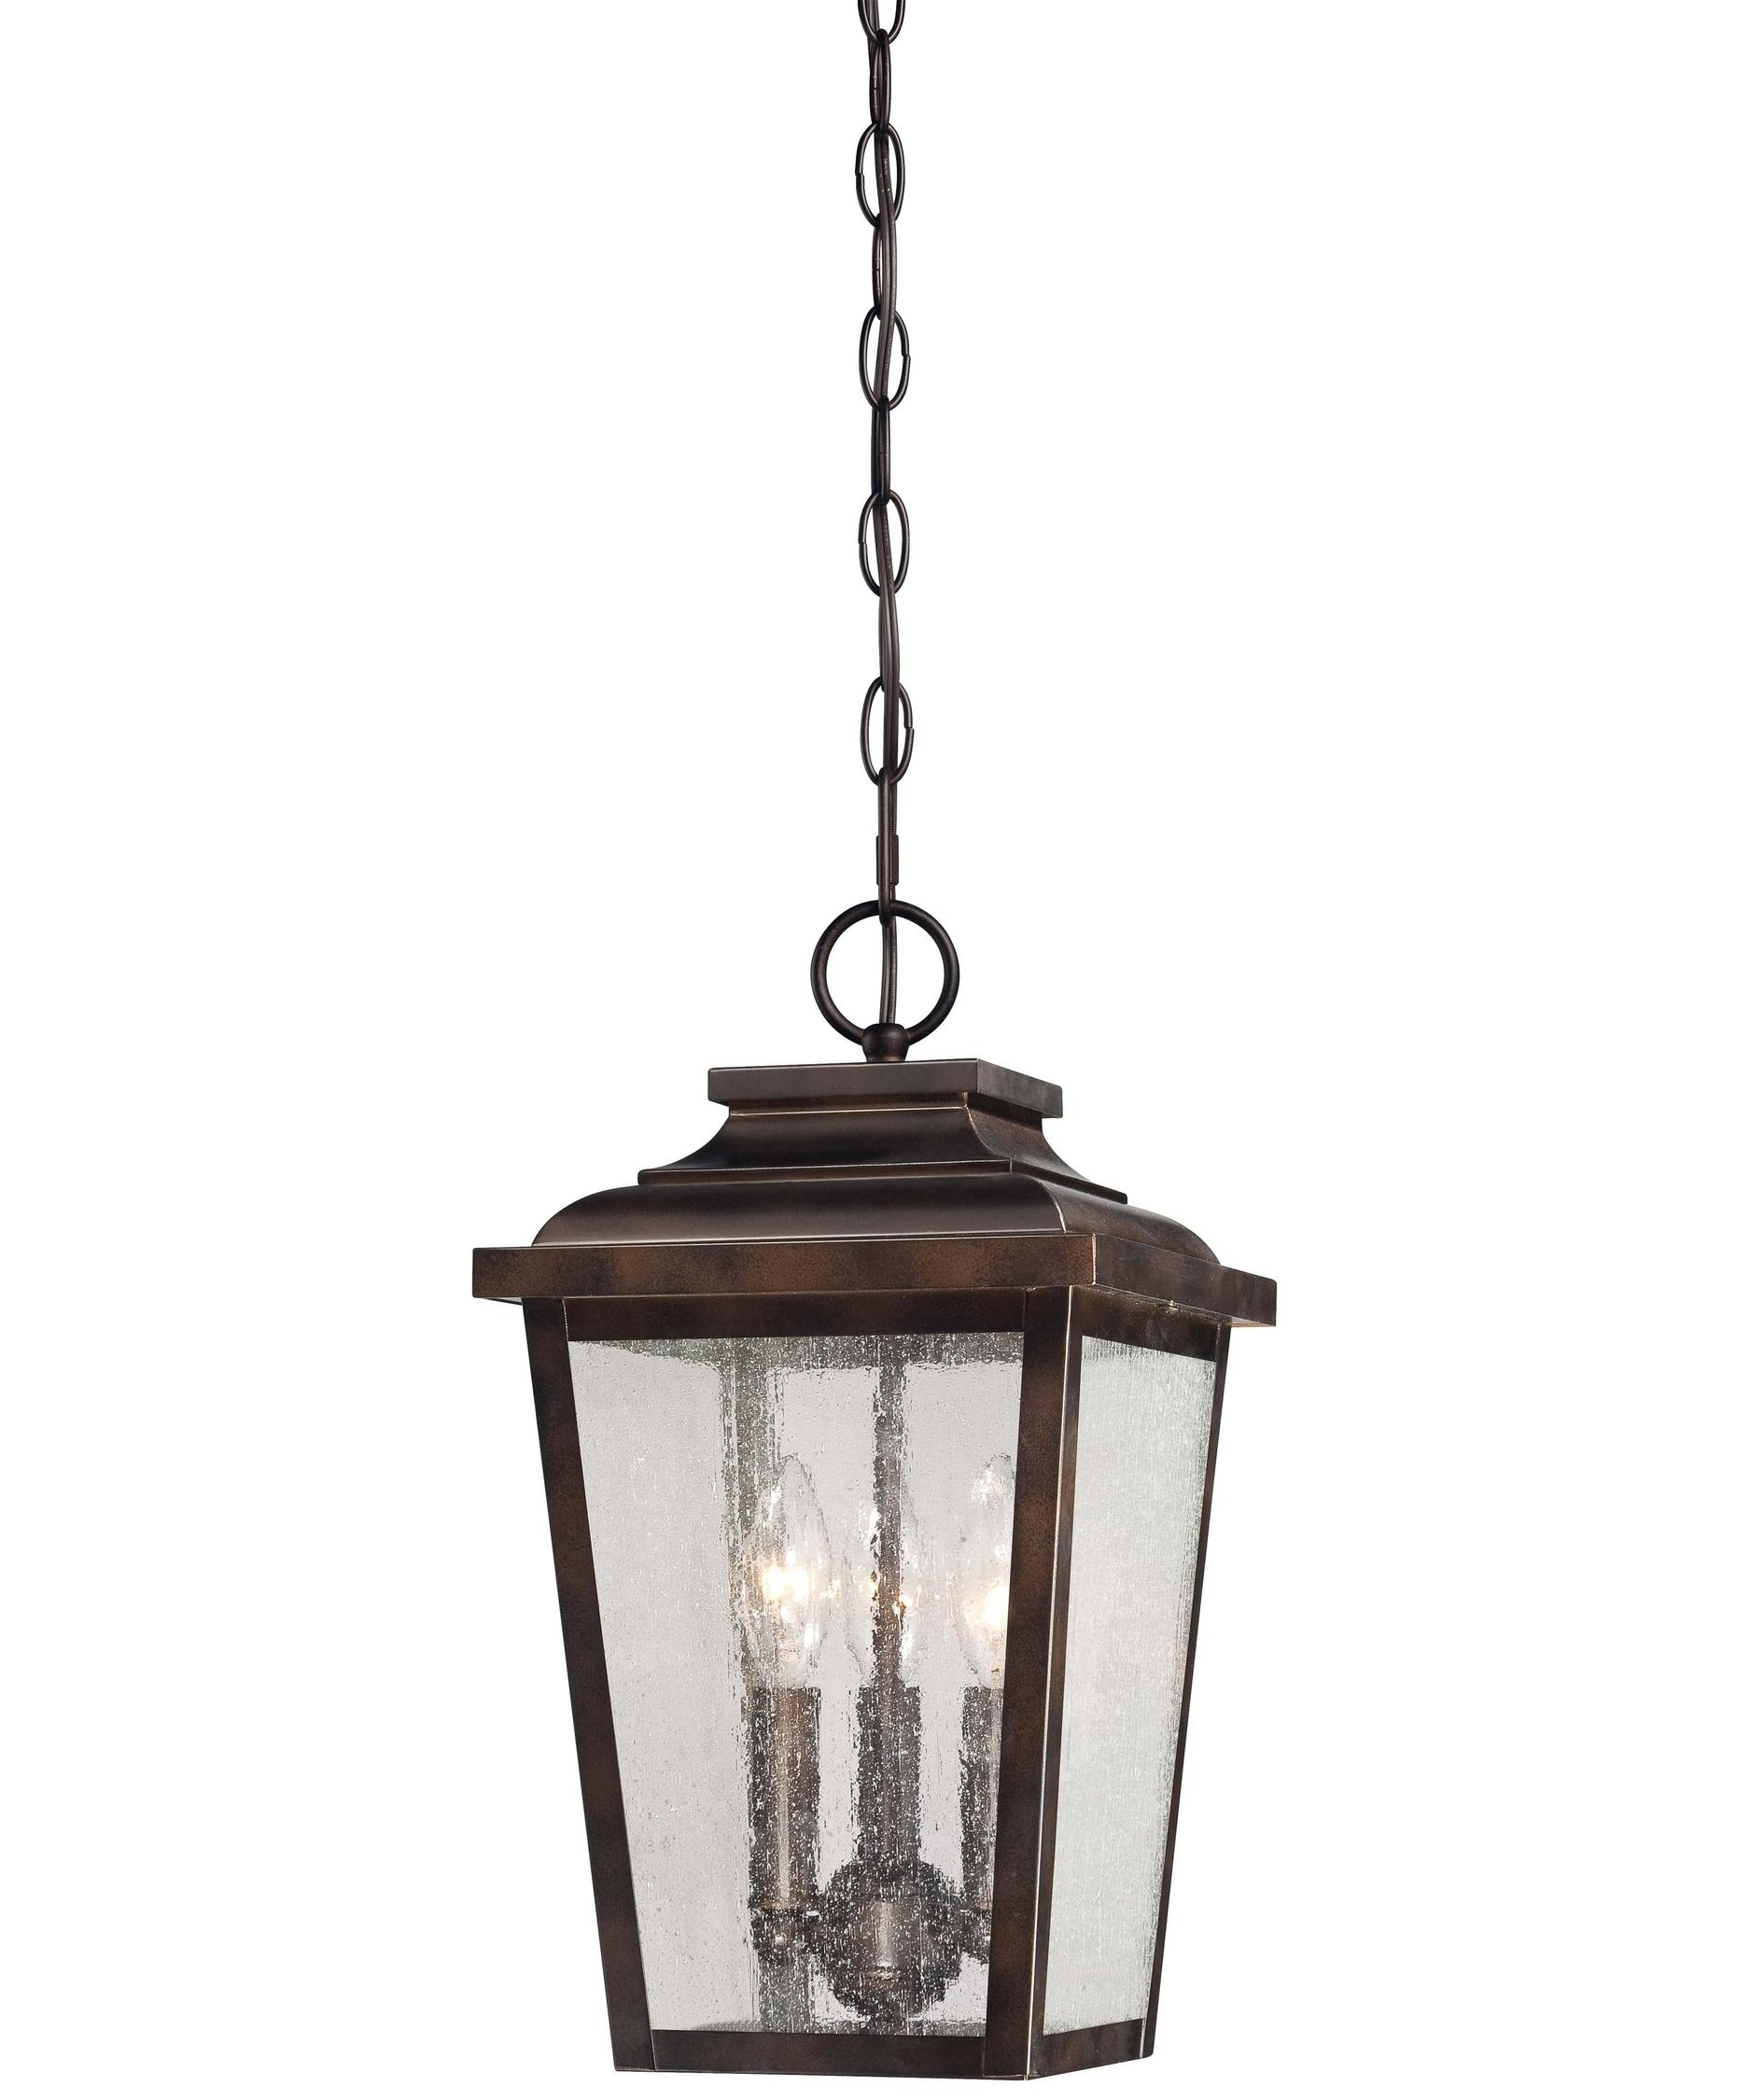 Popular Photo of Outdoor Hanging Light Pendants